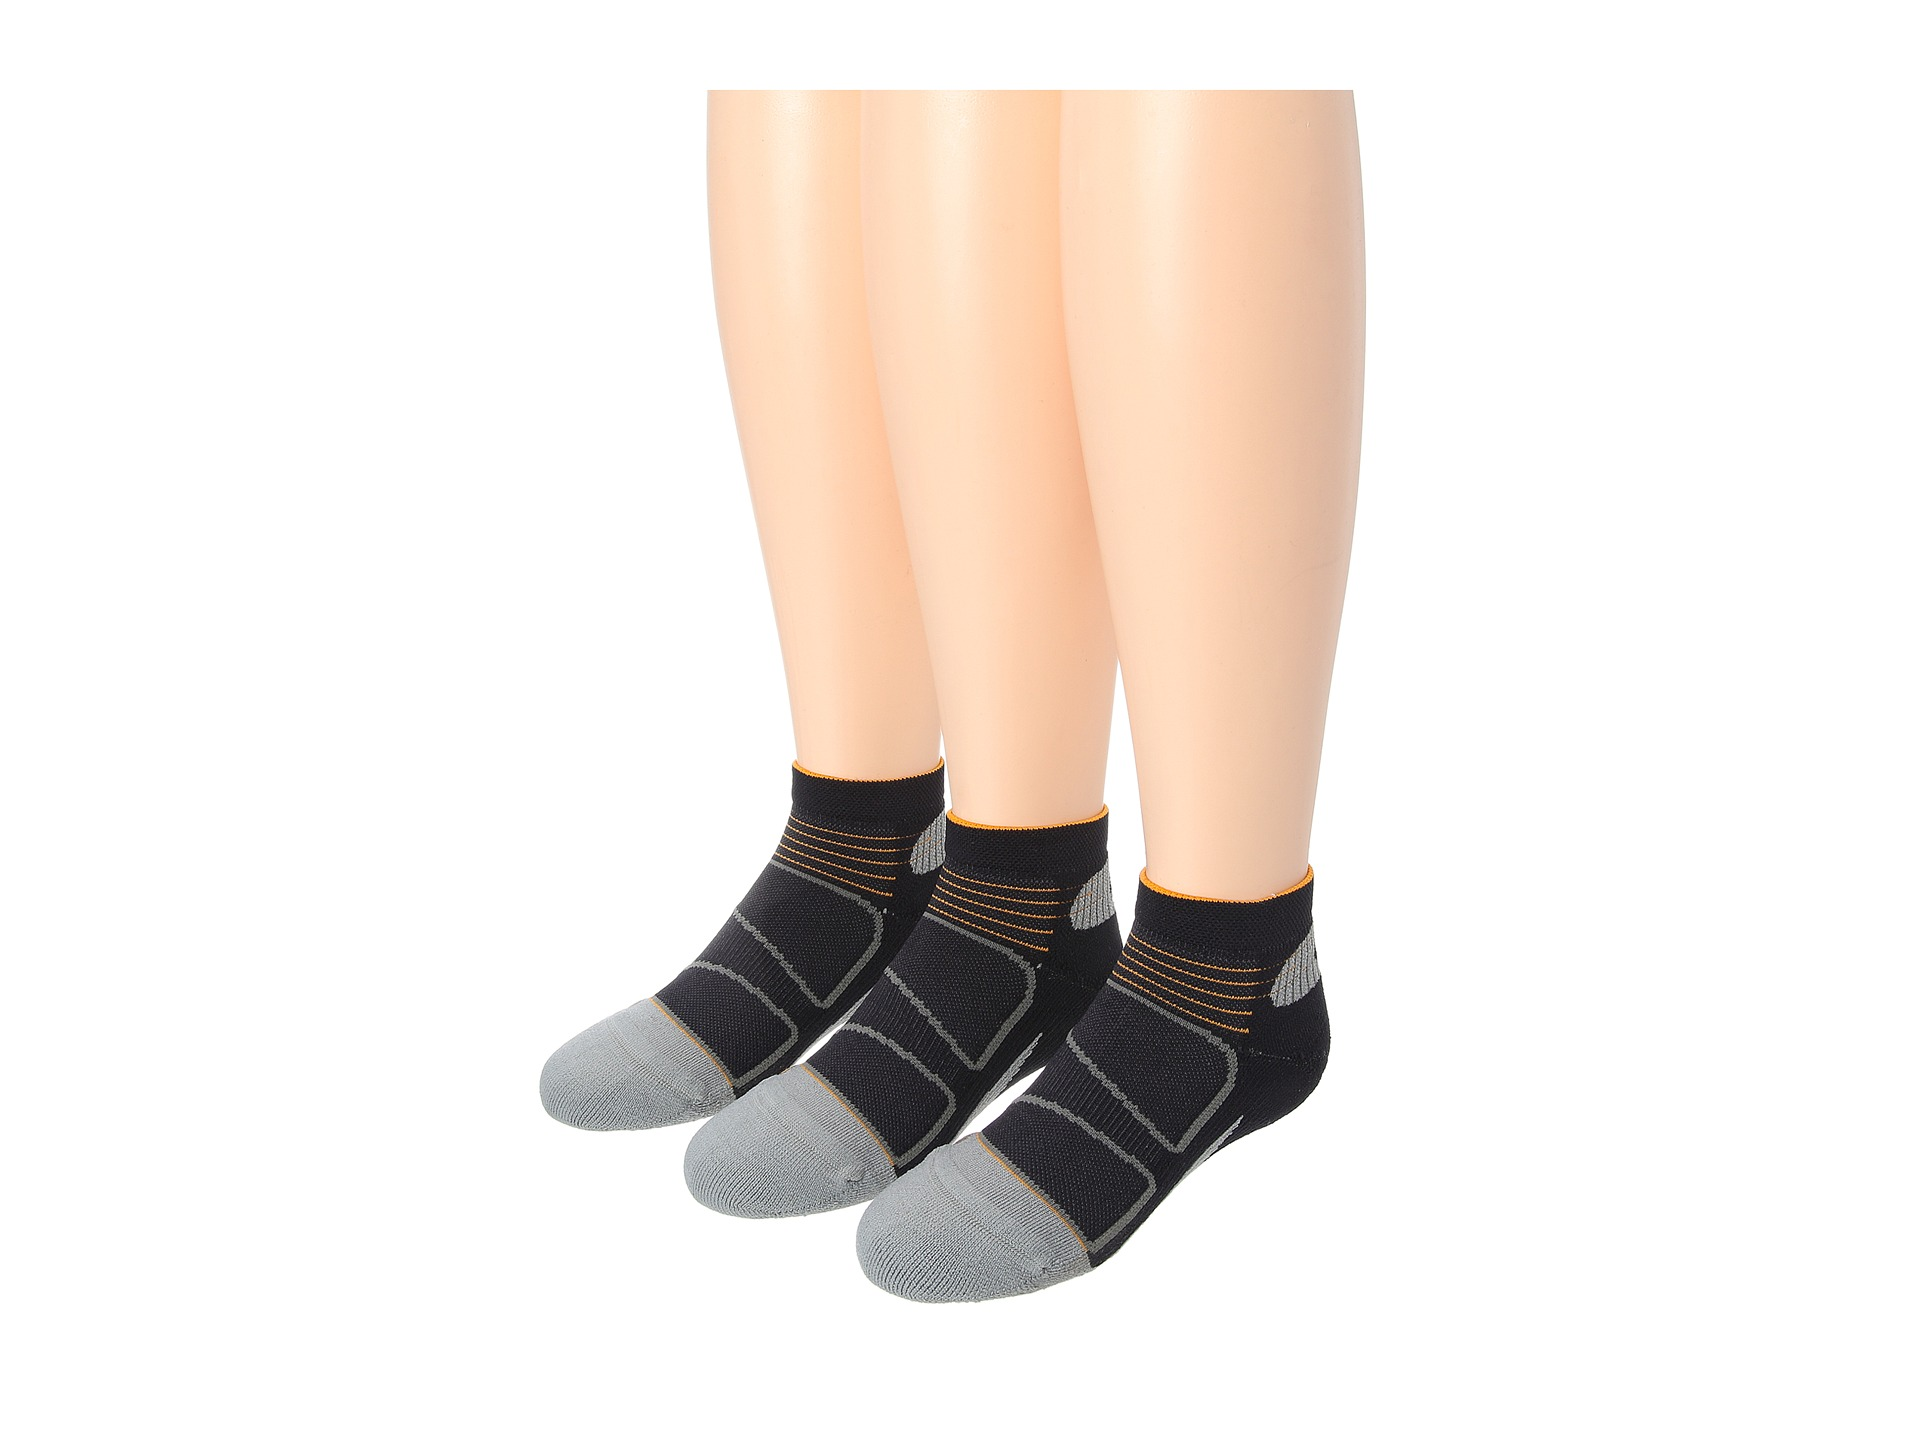 Feetures Elite Light Cushion Low Cut 3 Pair Pack Black